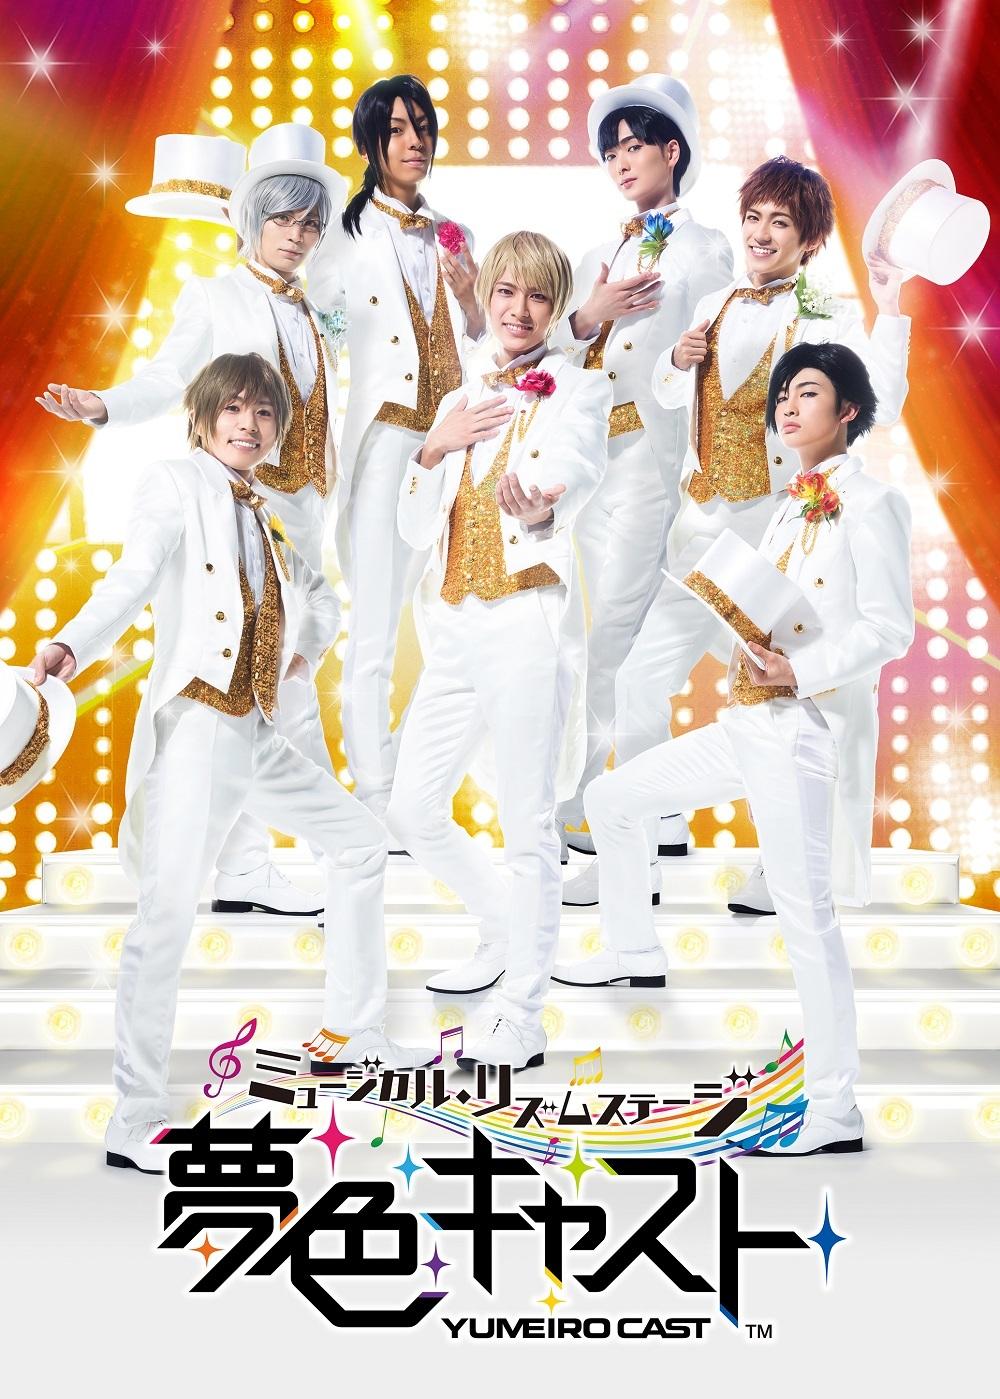 (C)SEGA/夢色カンパニー (C)ミュージカル・リズムステージ「夢色キャスト」製作委員会